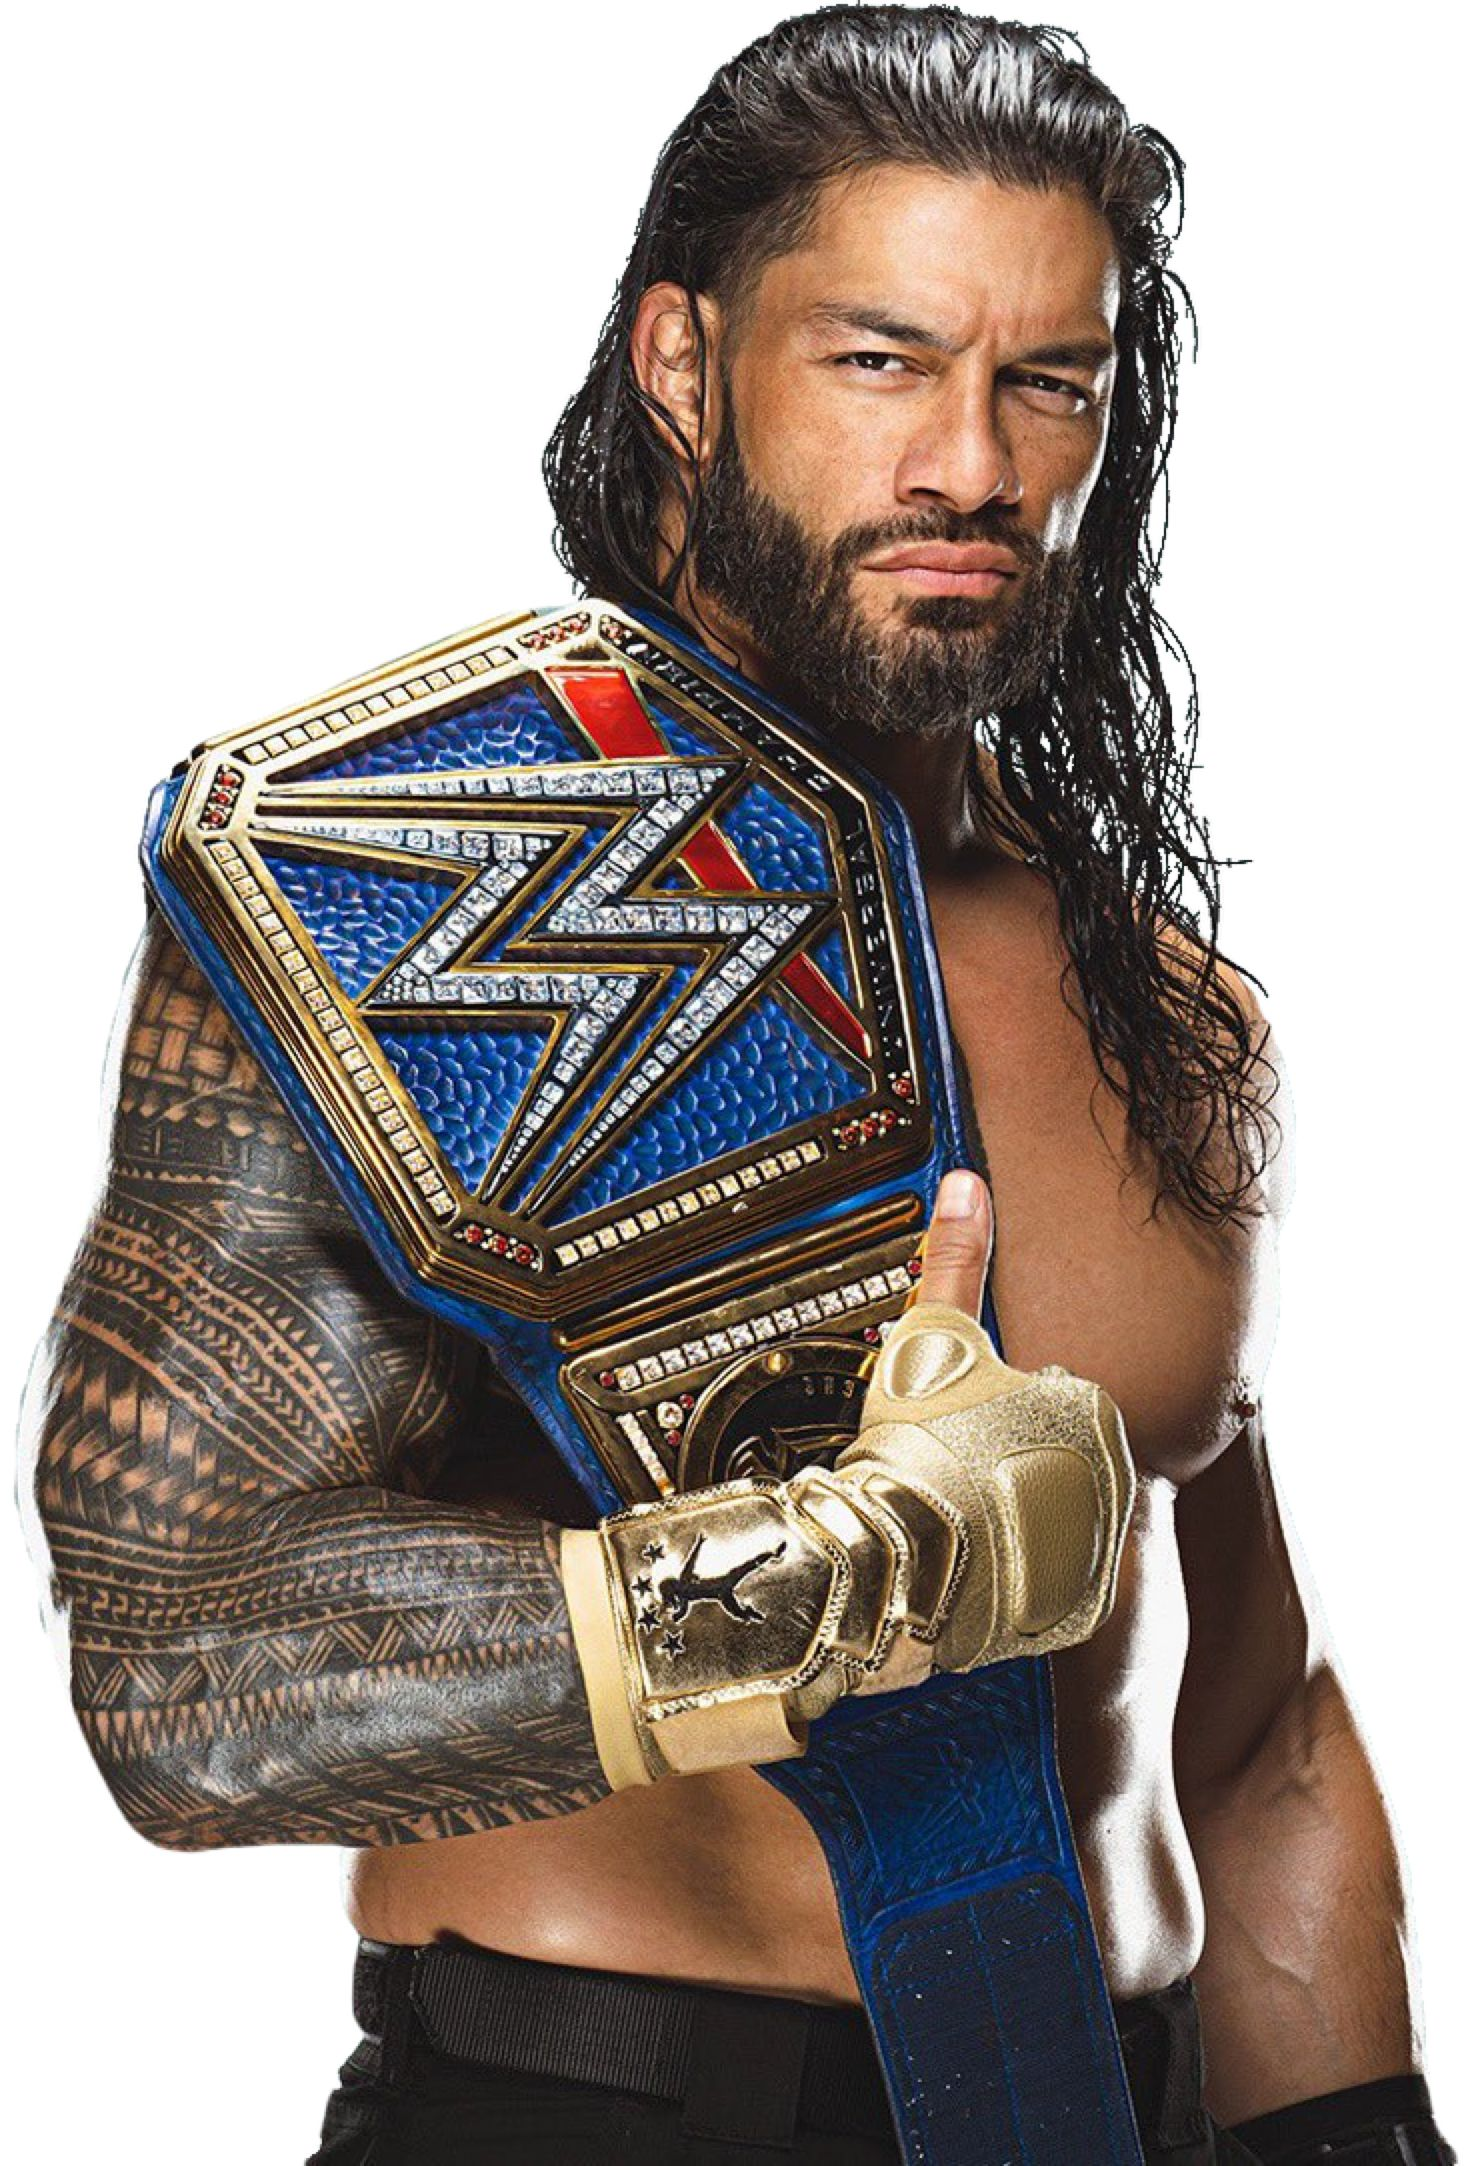 Roman Reigns 2021 Universal Champion Png By Ambriegnsasylum16 On Deviantart In 2021 Roman Reigns Roman Reings Wwe World